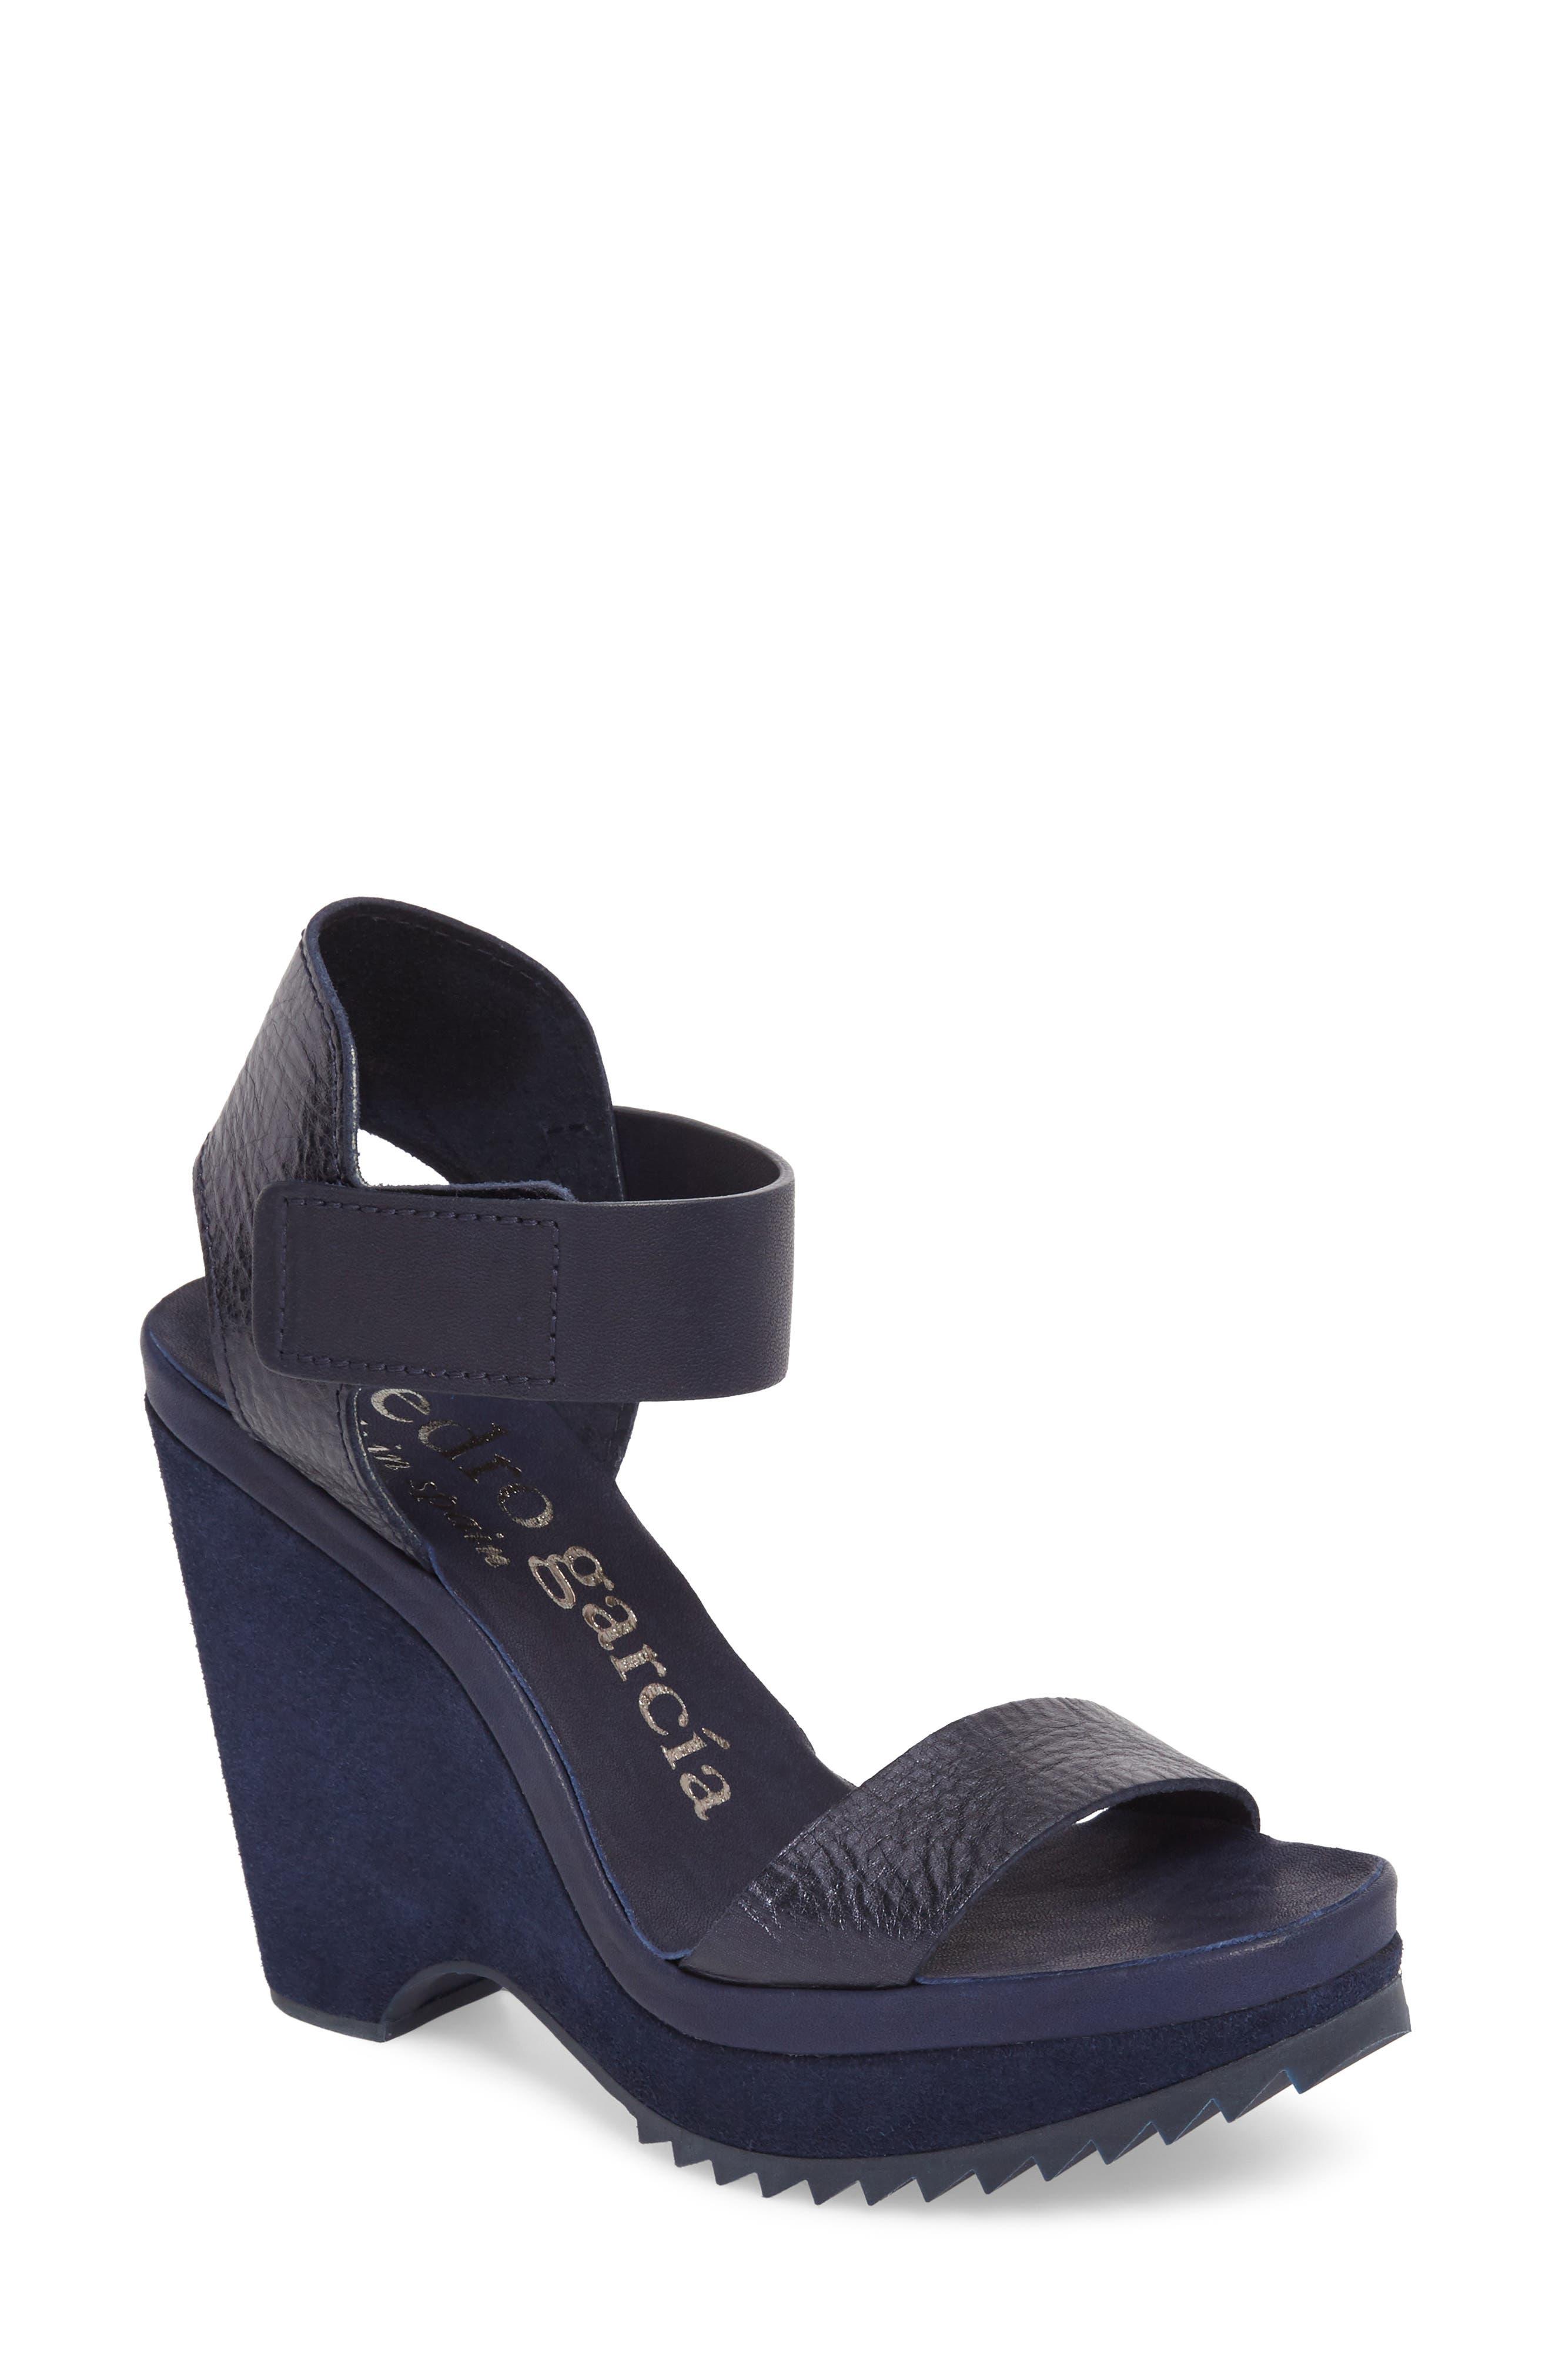 Vida Platform Wedge Sandal,                         Main,                         color, MARINA